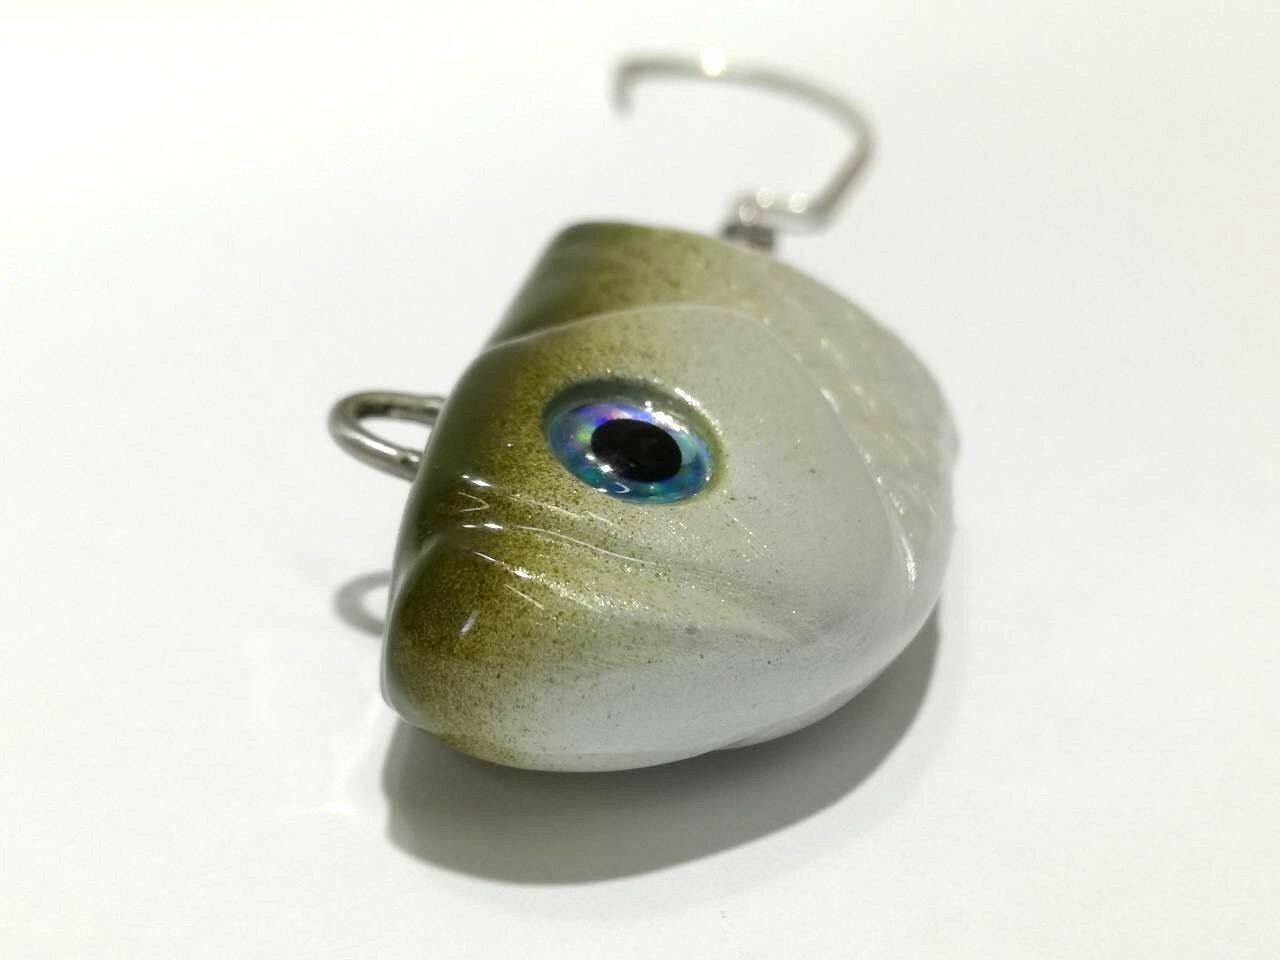 SPRO gutsbait UV 110 11 Cm 14 G 3//0 offset Olive Opal Pearl Lemon salt Mojito Aqua